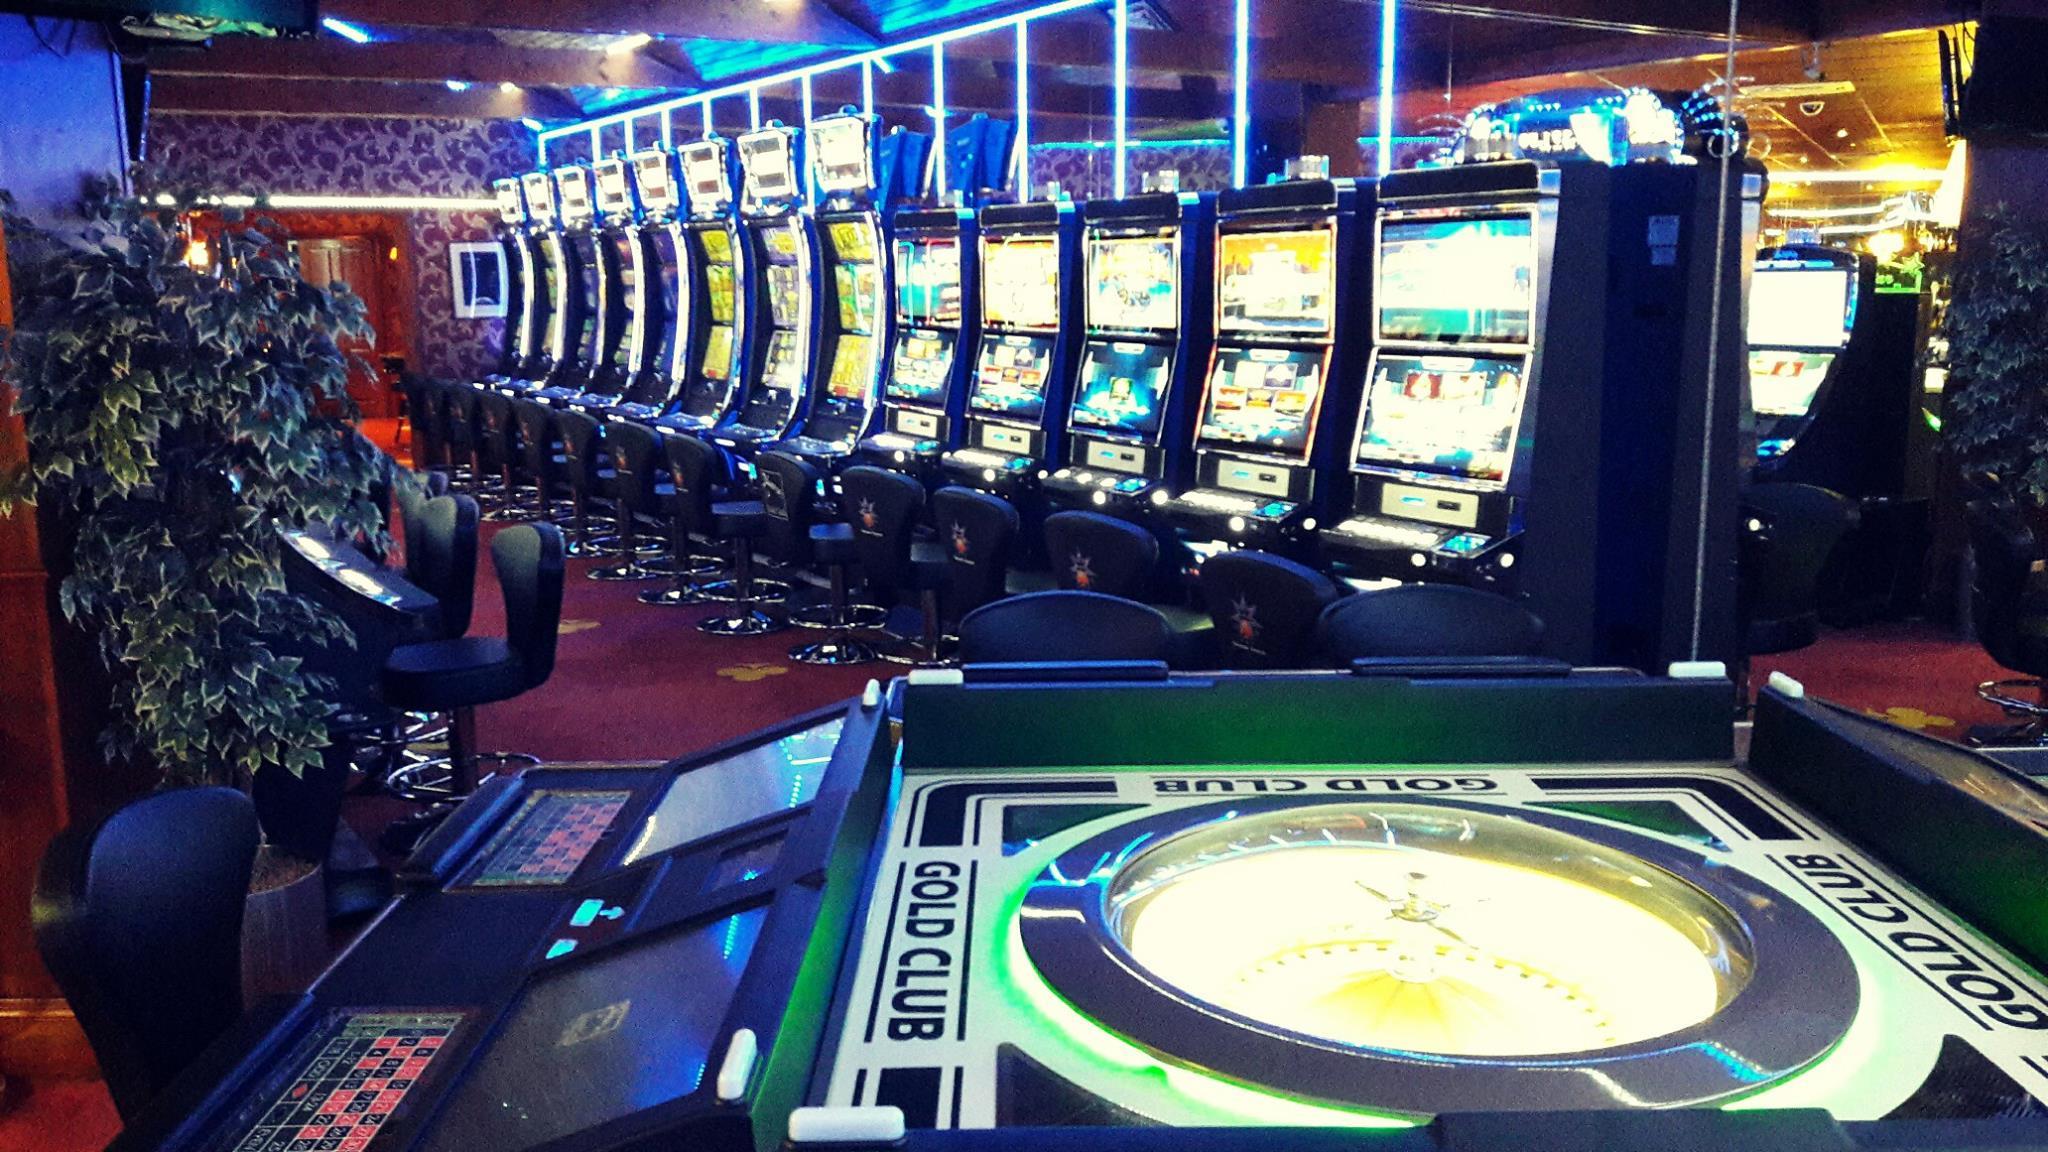 zinnwald casino